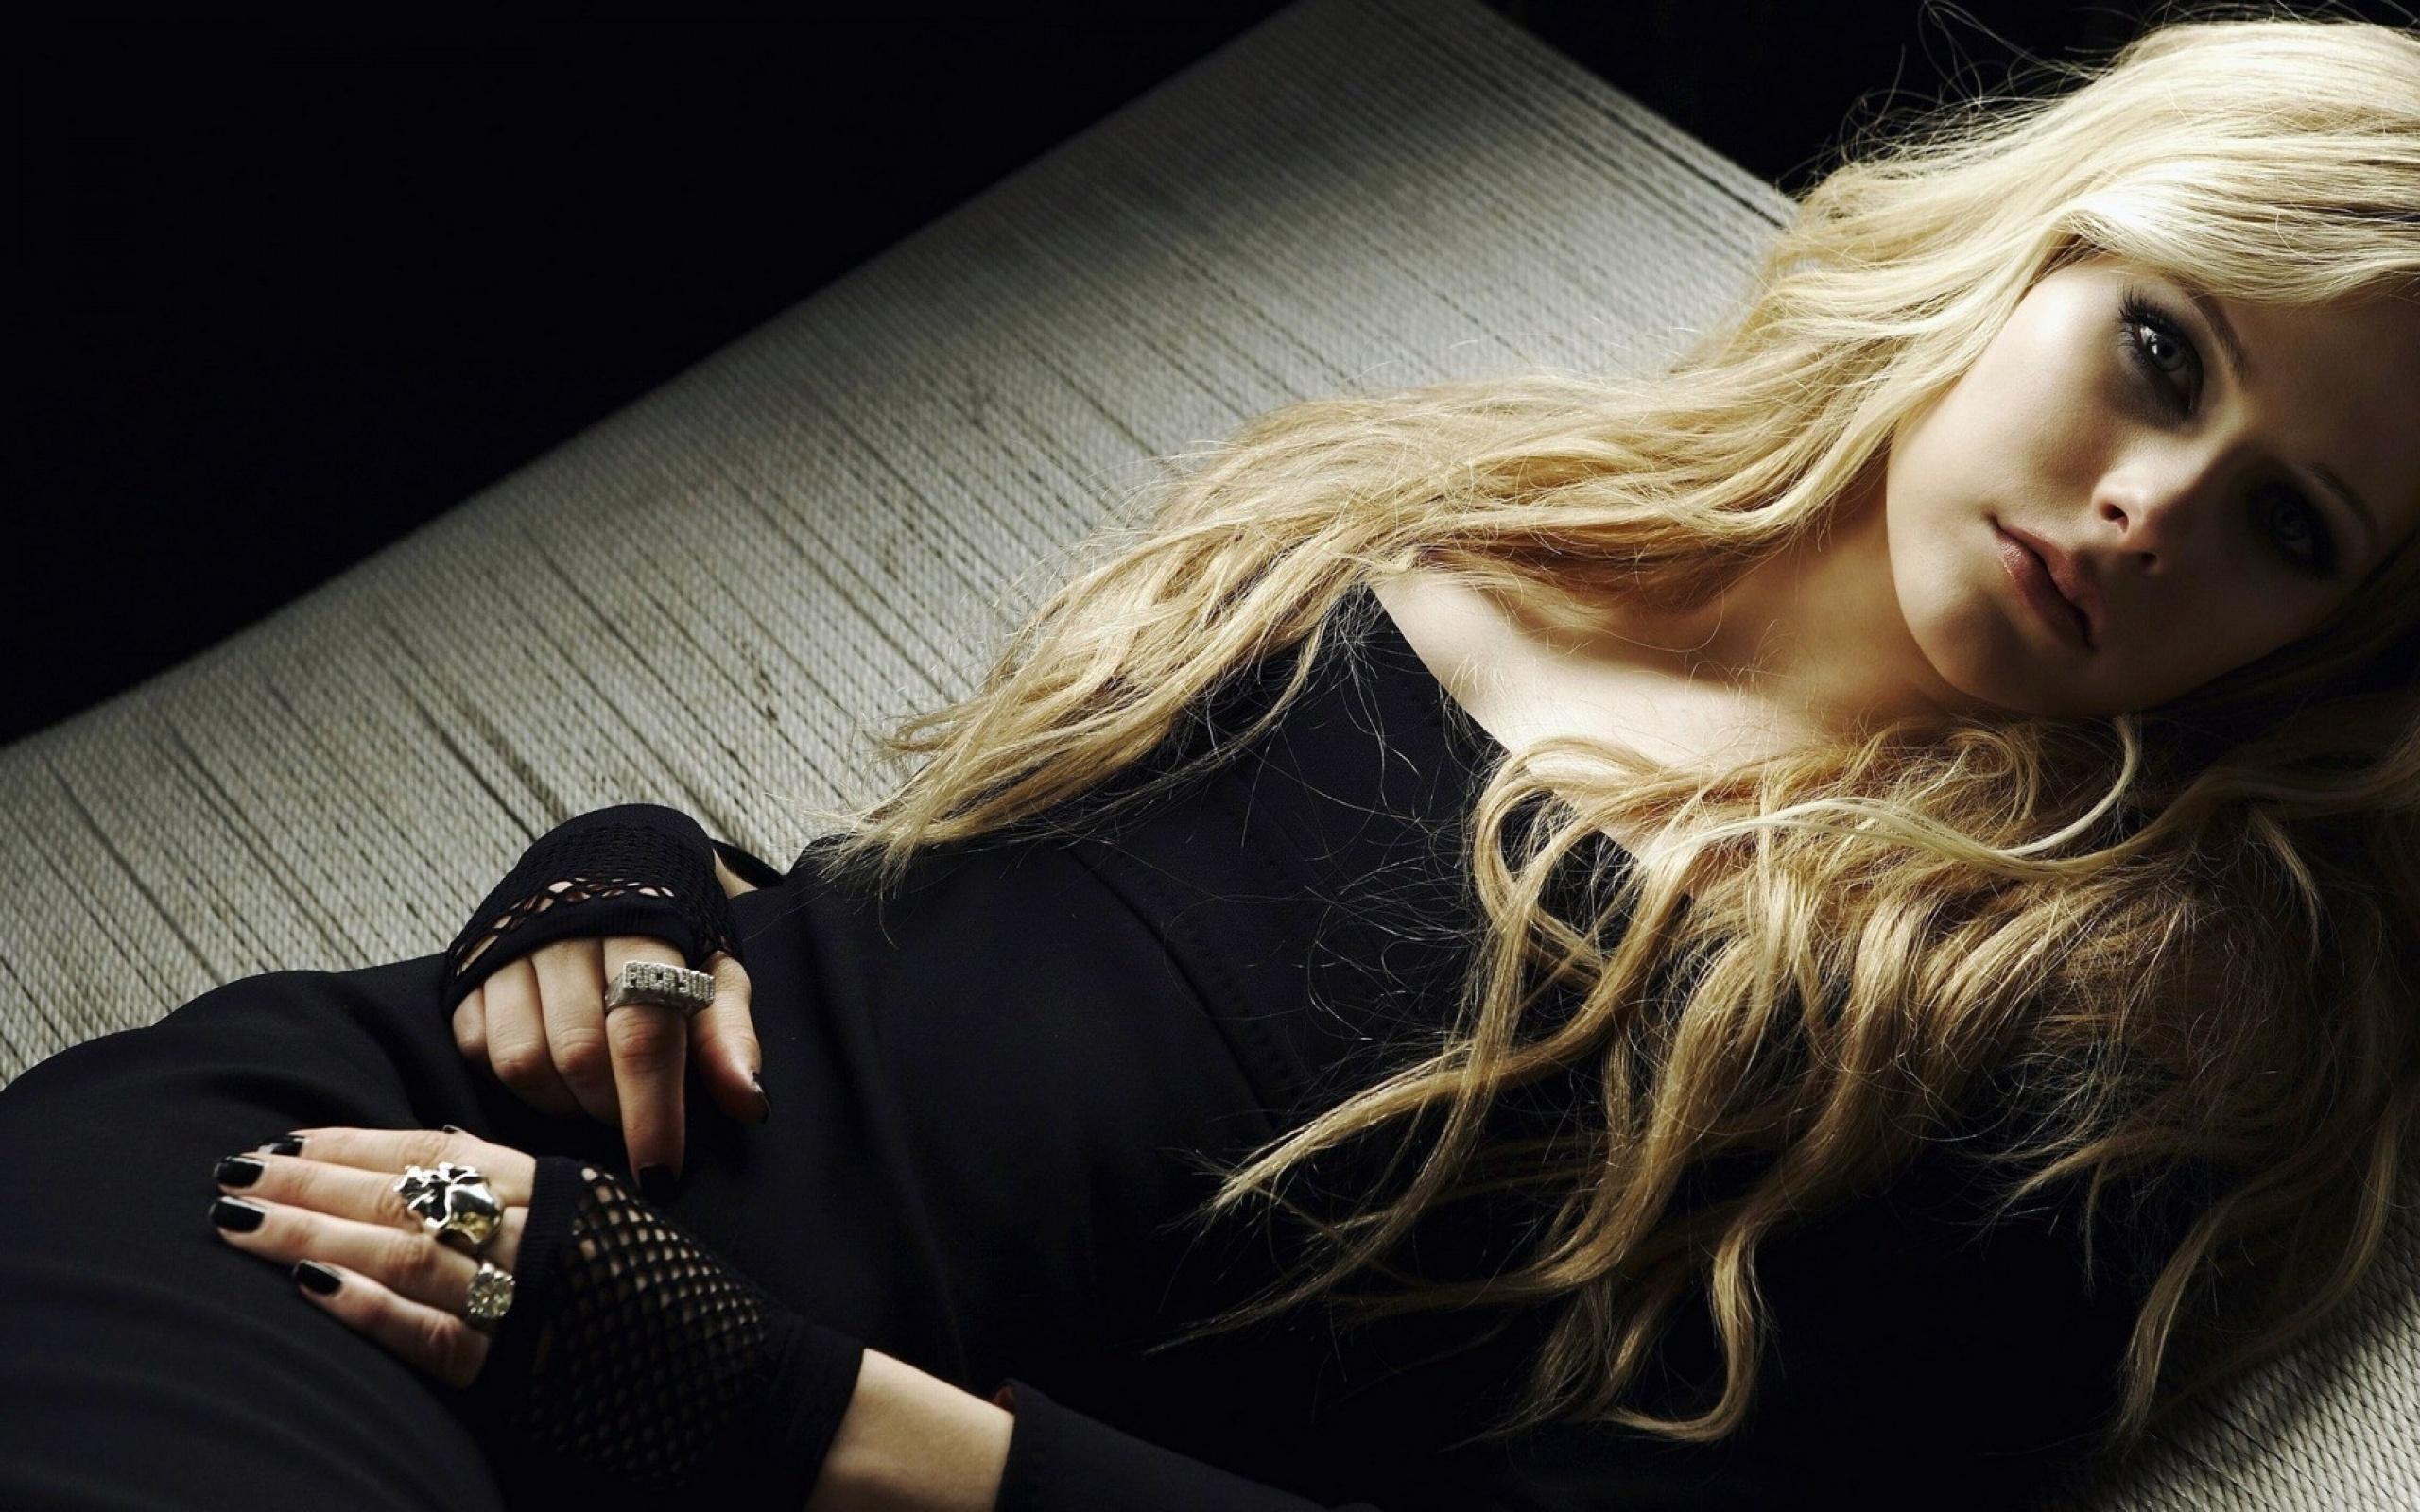 Avril lavigne black evening dress